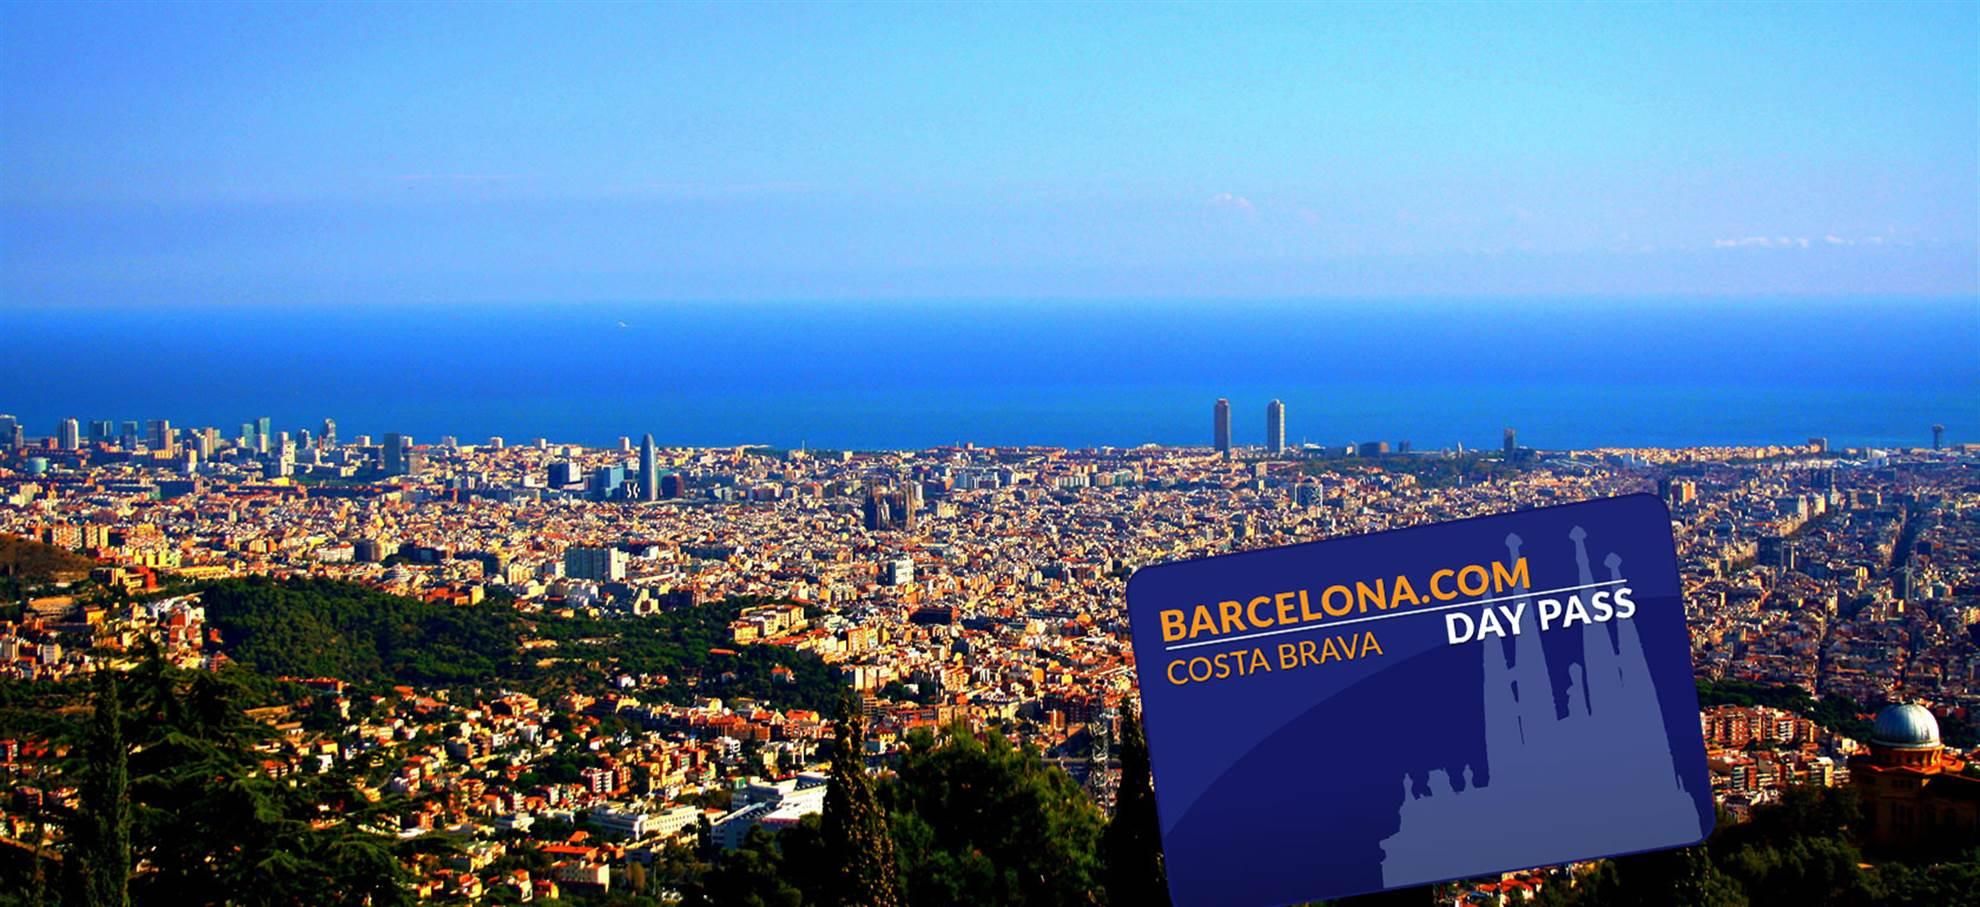 Costa Brava - Barcelona.com Pass Journée